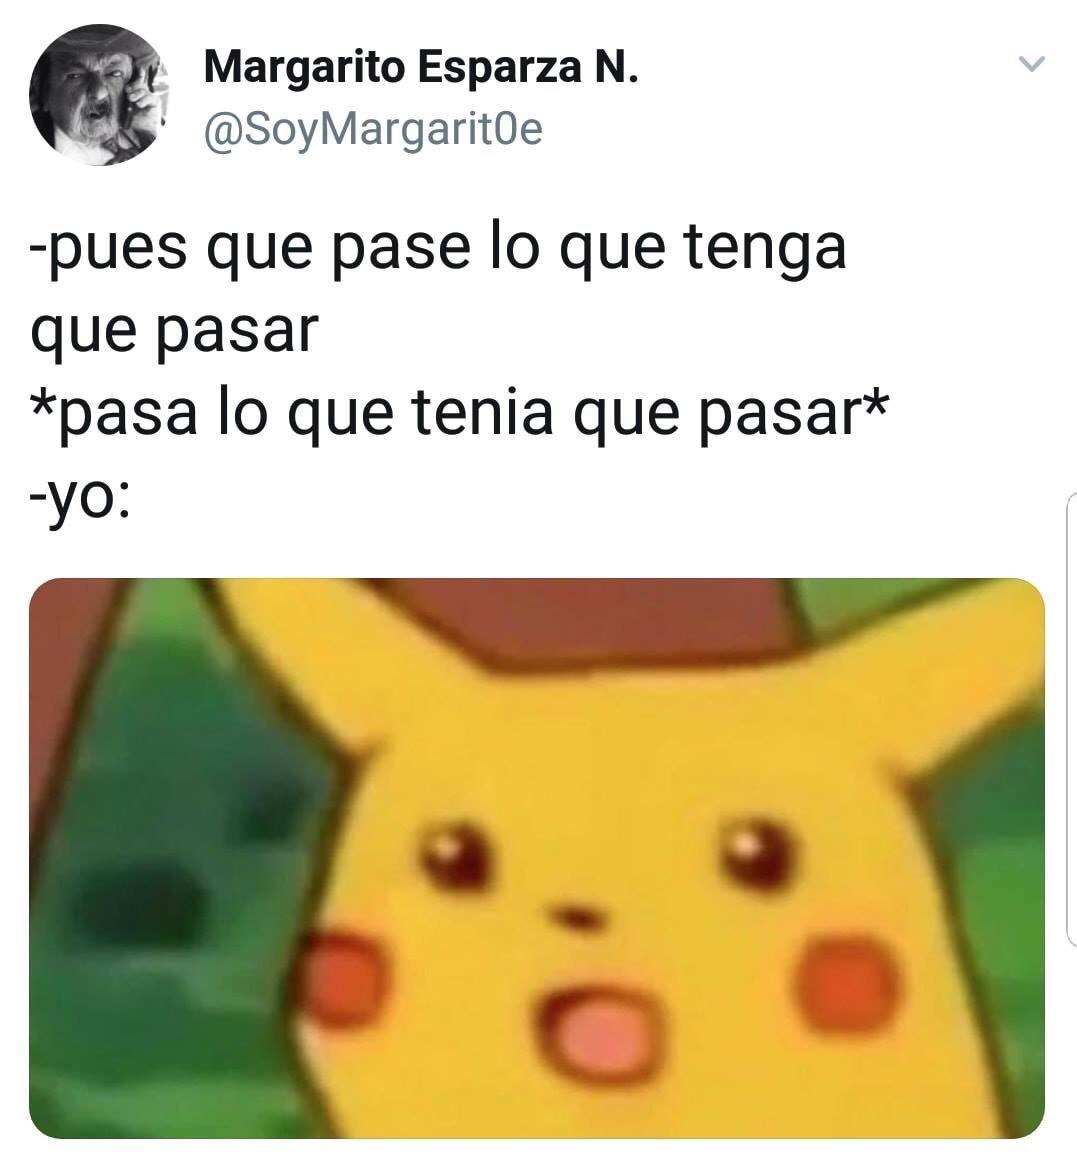 De este capítulo de Pokémon salió el meme de Pikachu sorprendido